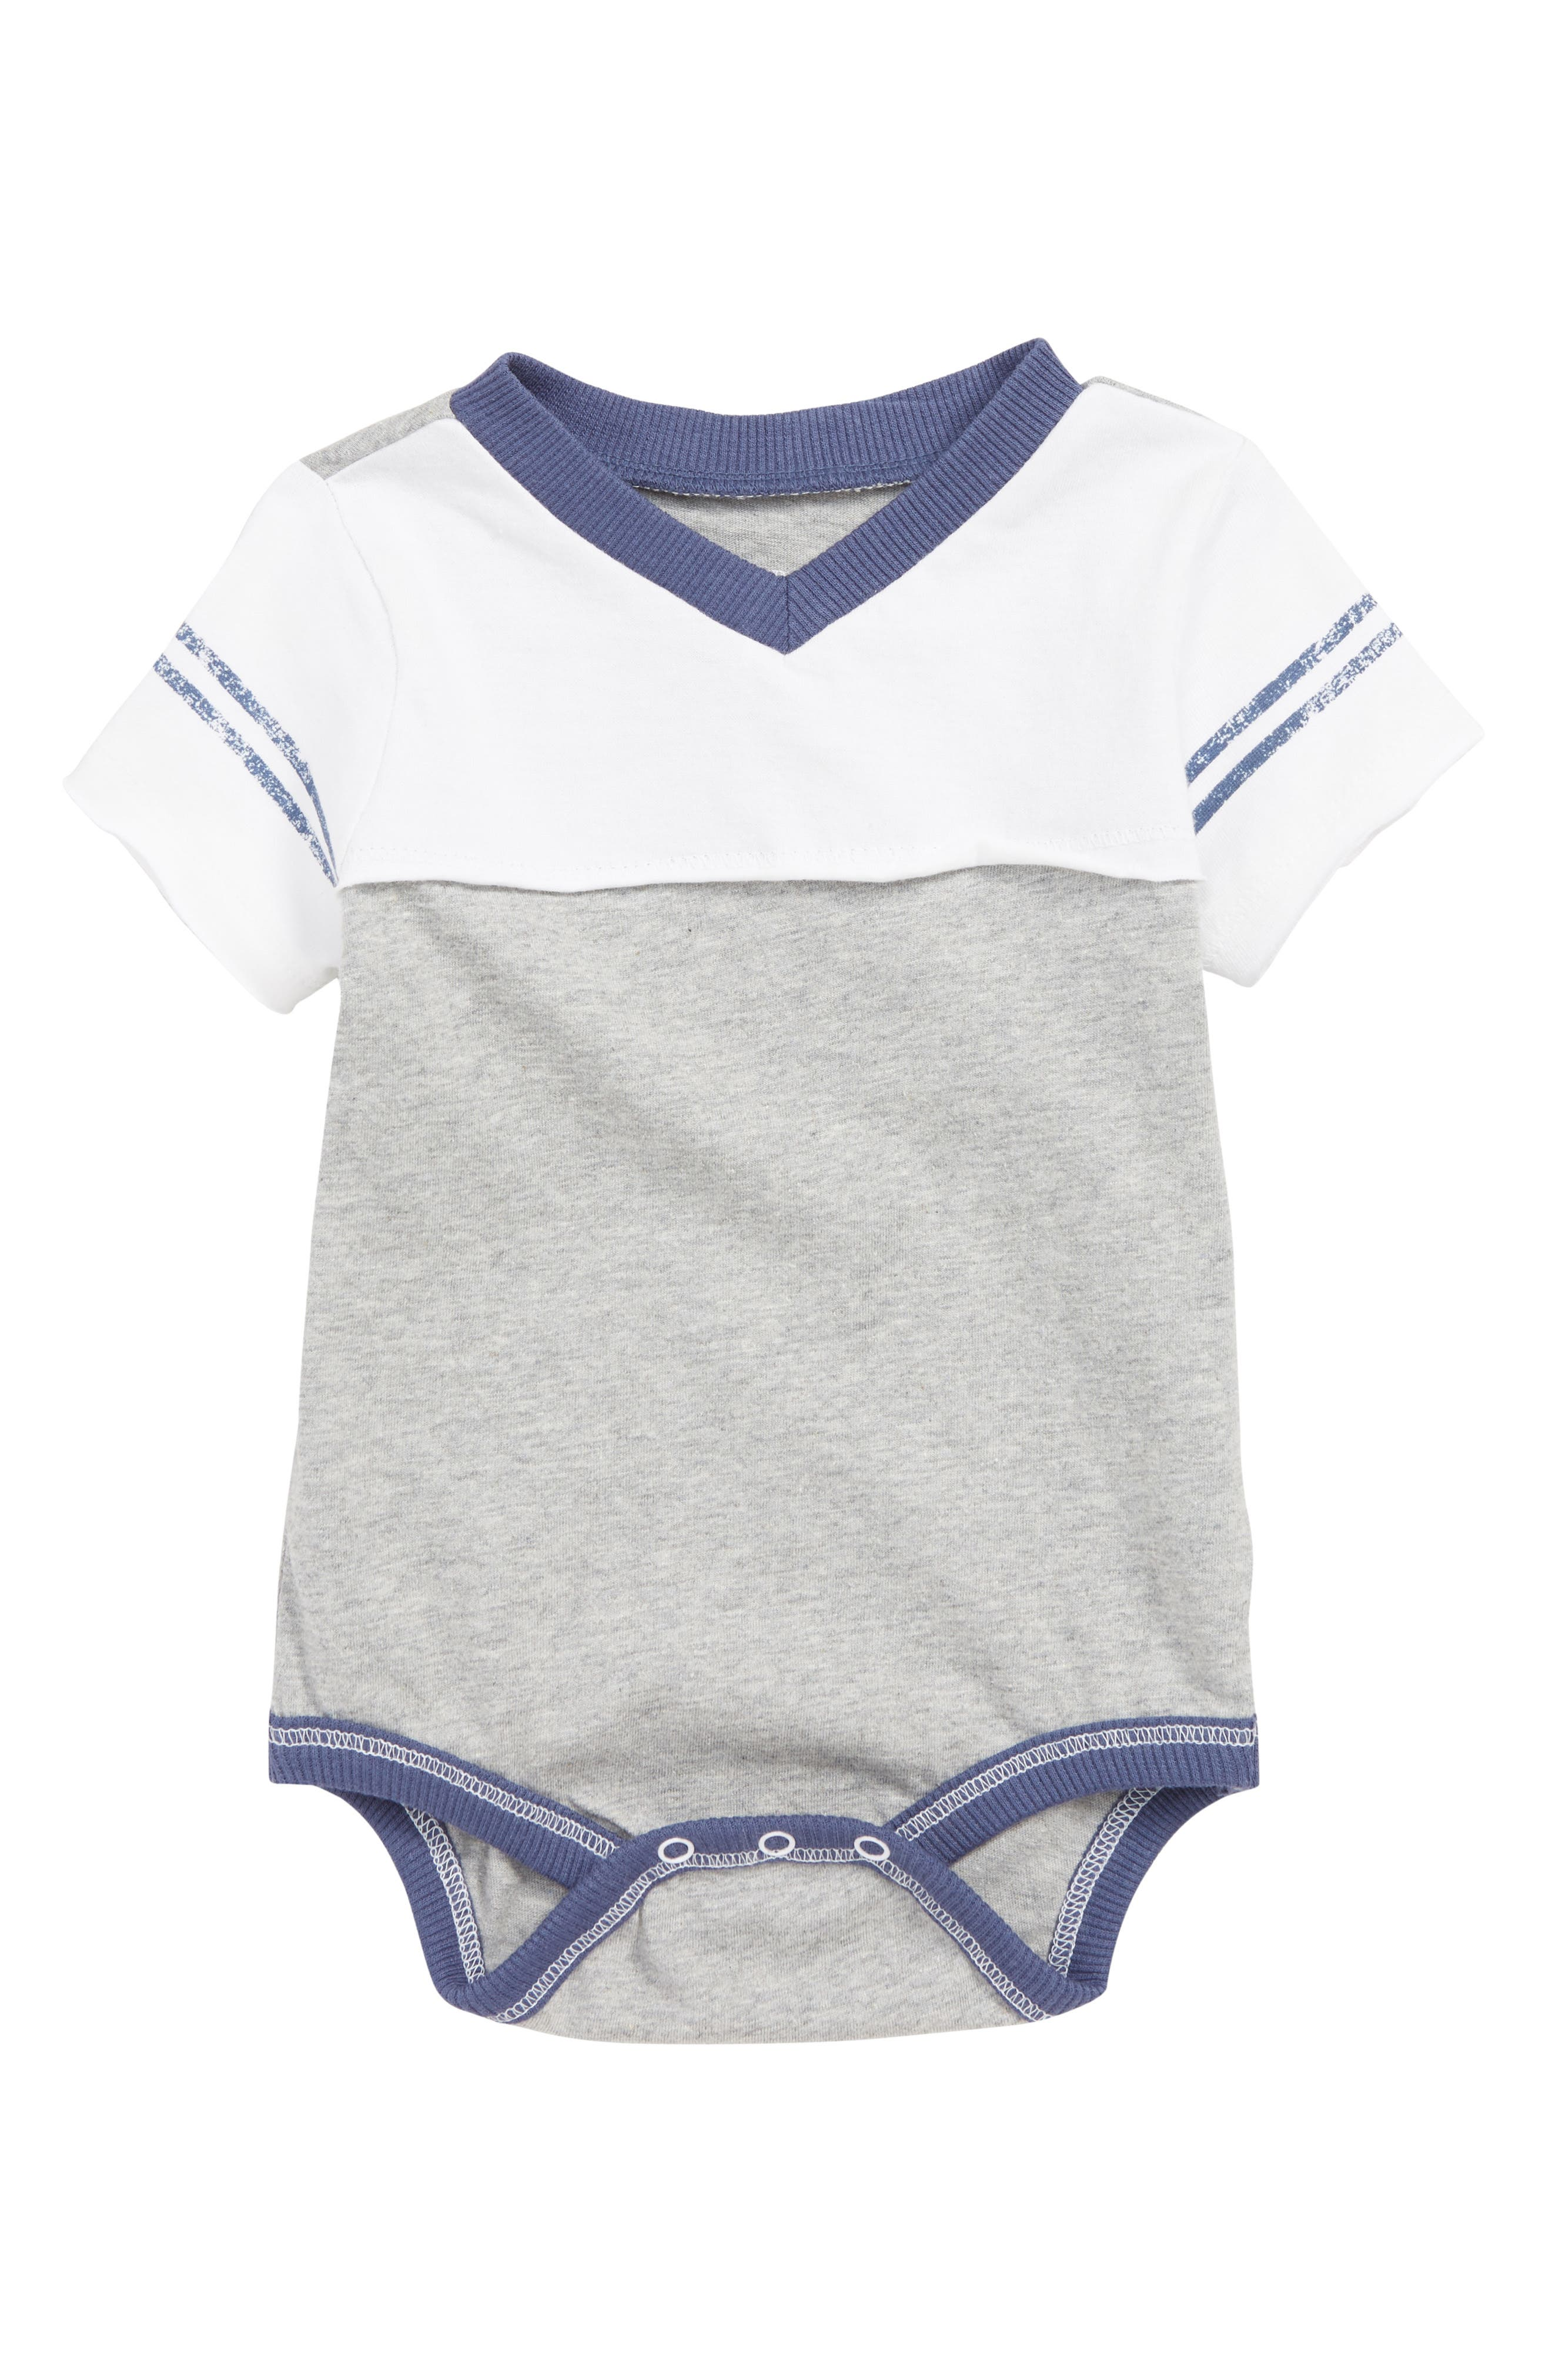 BURT'S BEES BABY, Colorblock Organic Cotton Bodysuit, Main thumbnail 1, color, 050